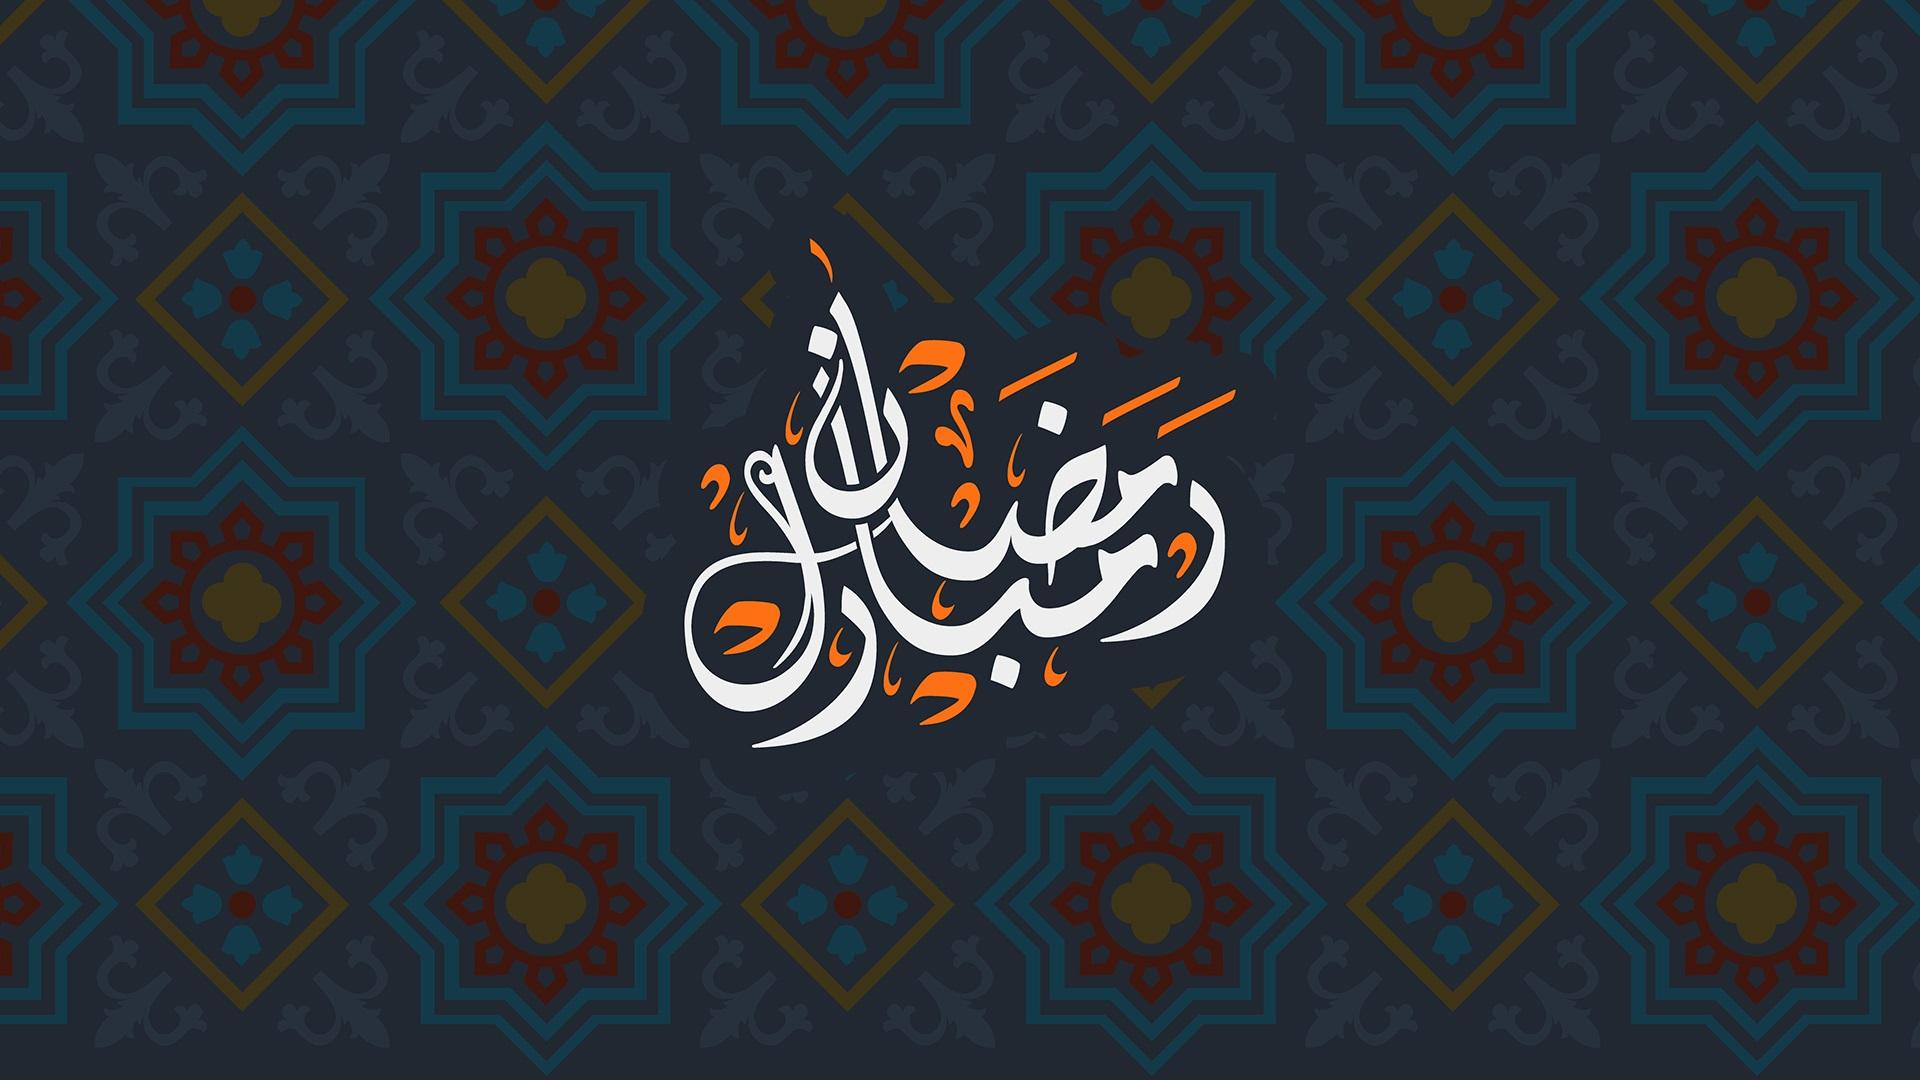 رمزيات رمضان من لستتي للبي بي رمضان كريم